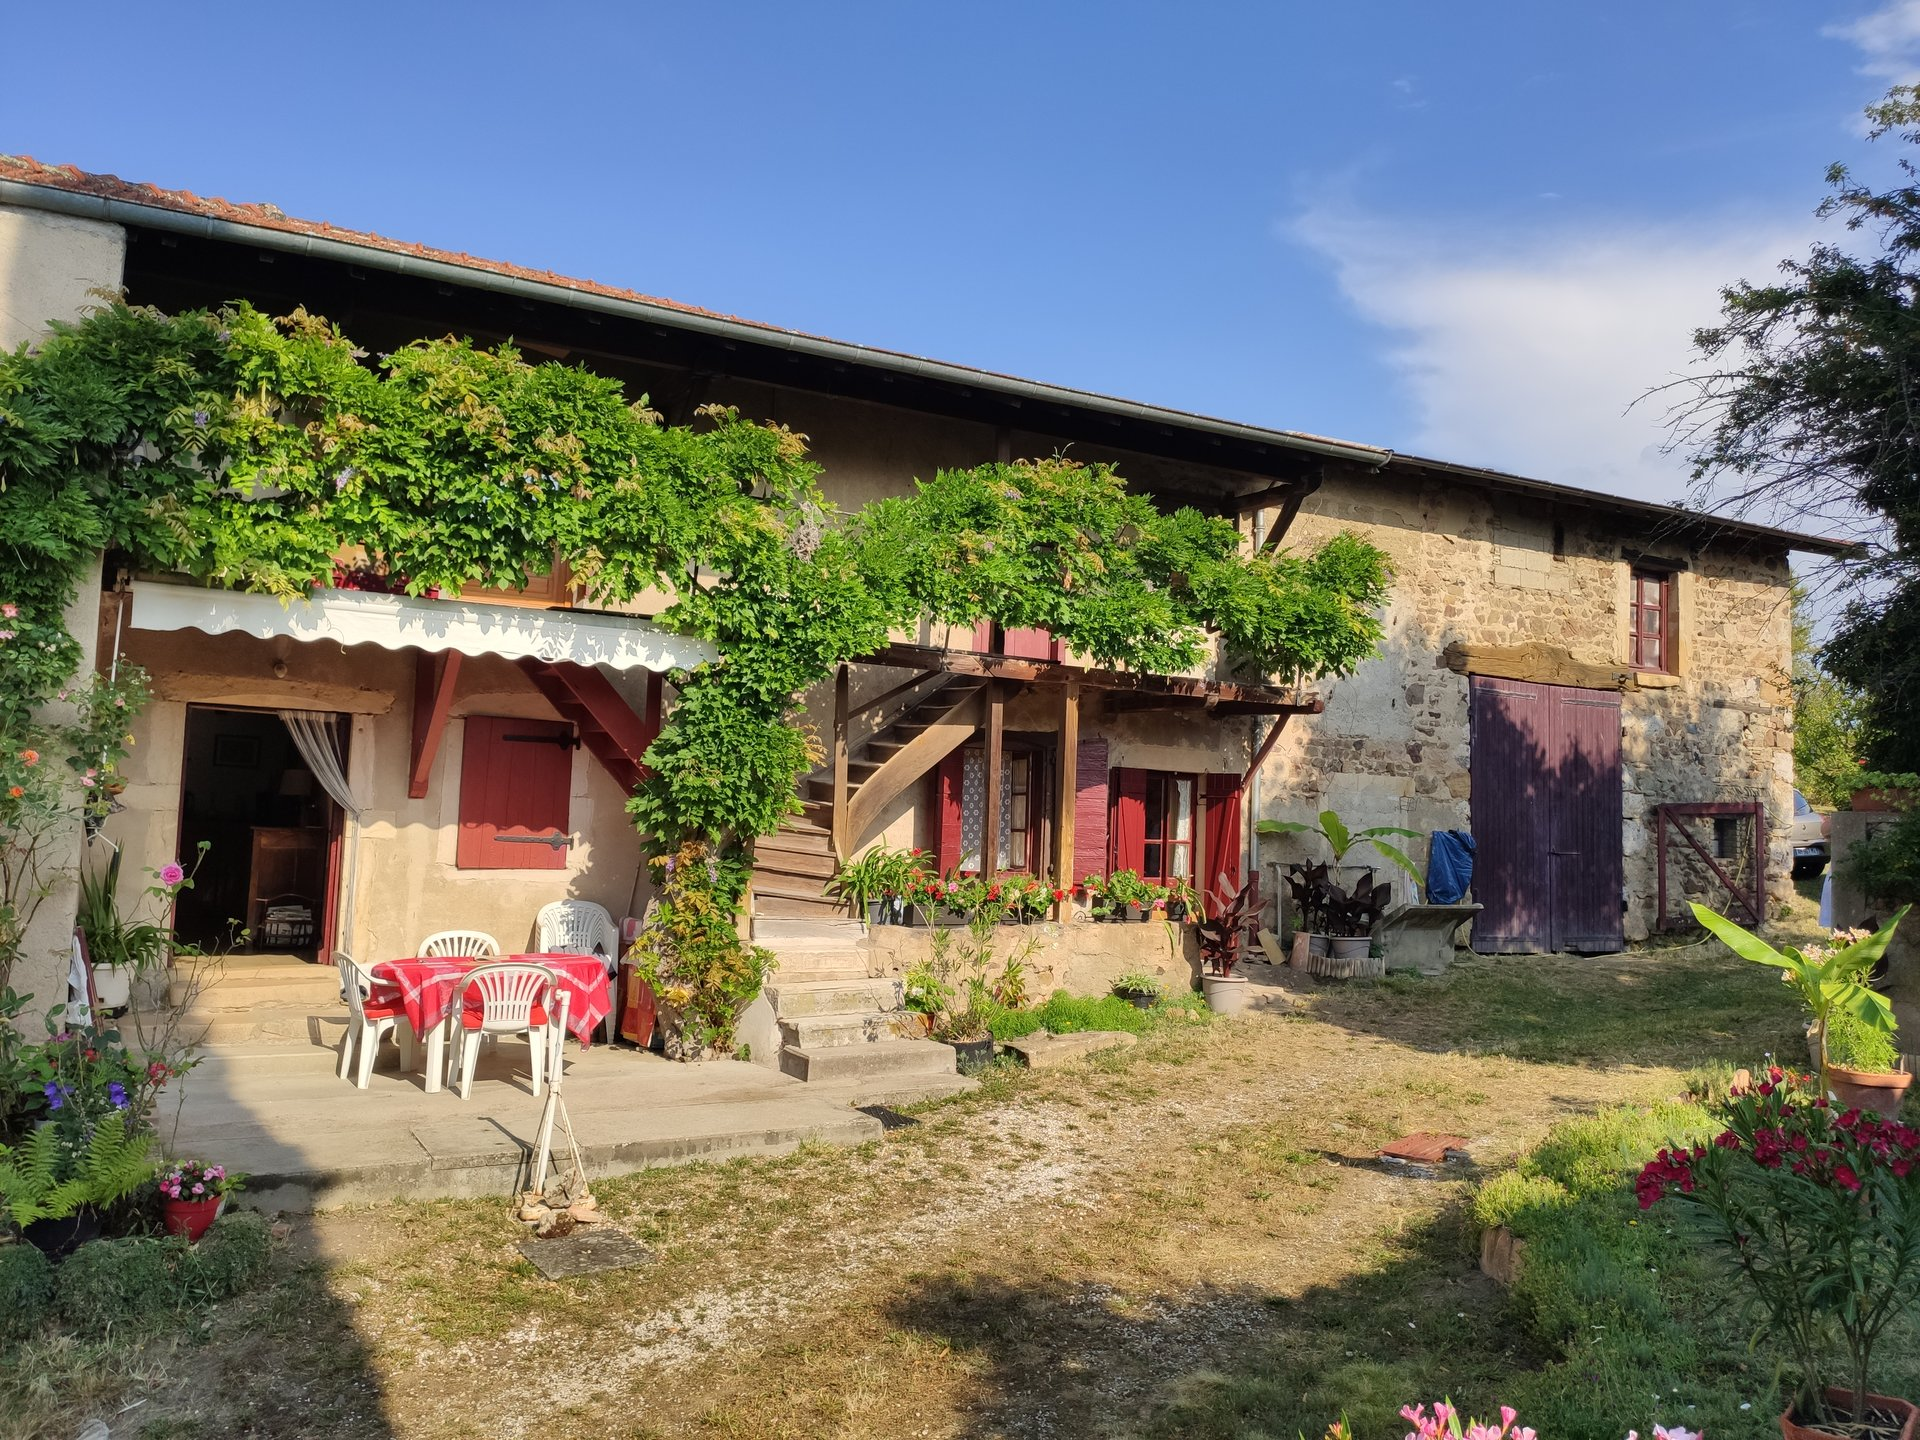 Maison ancienne 130 m² / 1700 m² terrain